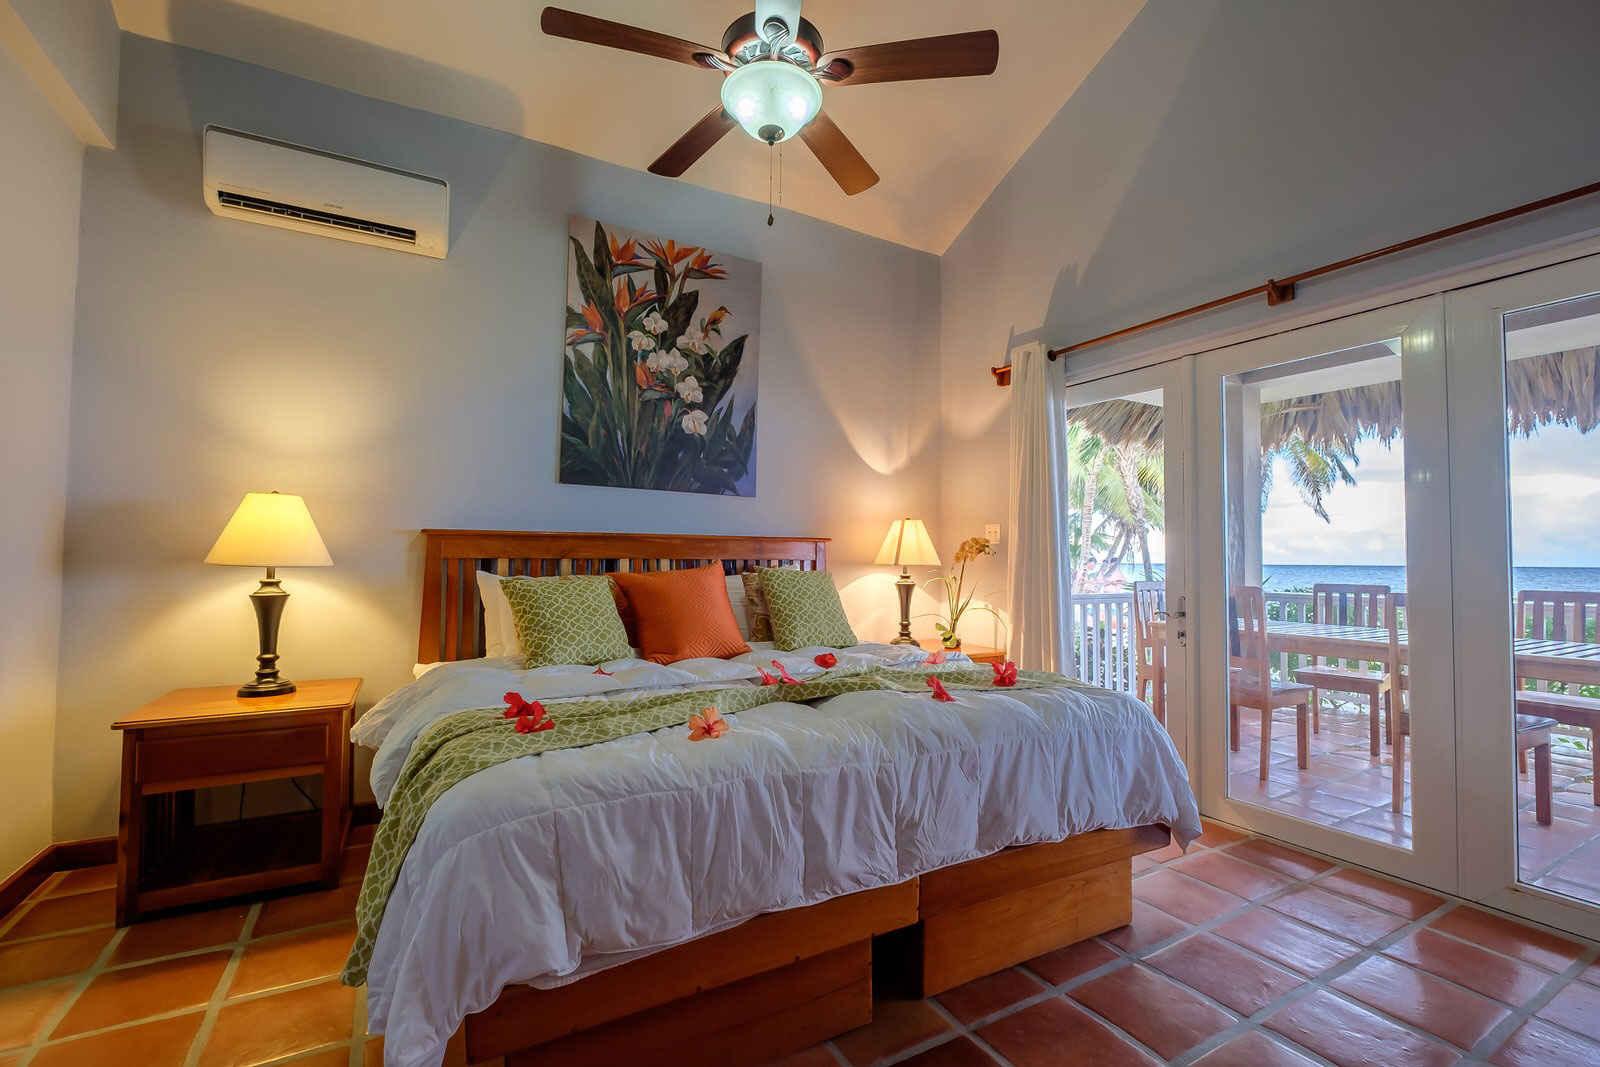 Sapphire-Beach-2-bedroom-2-bath-with-loft-8.jpg